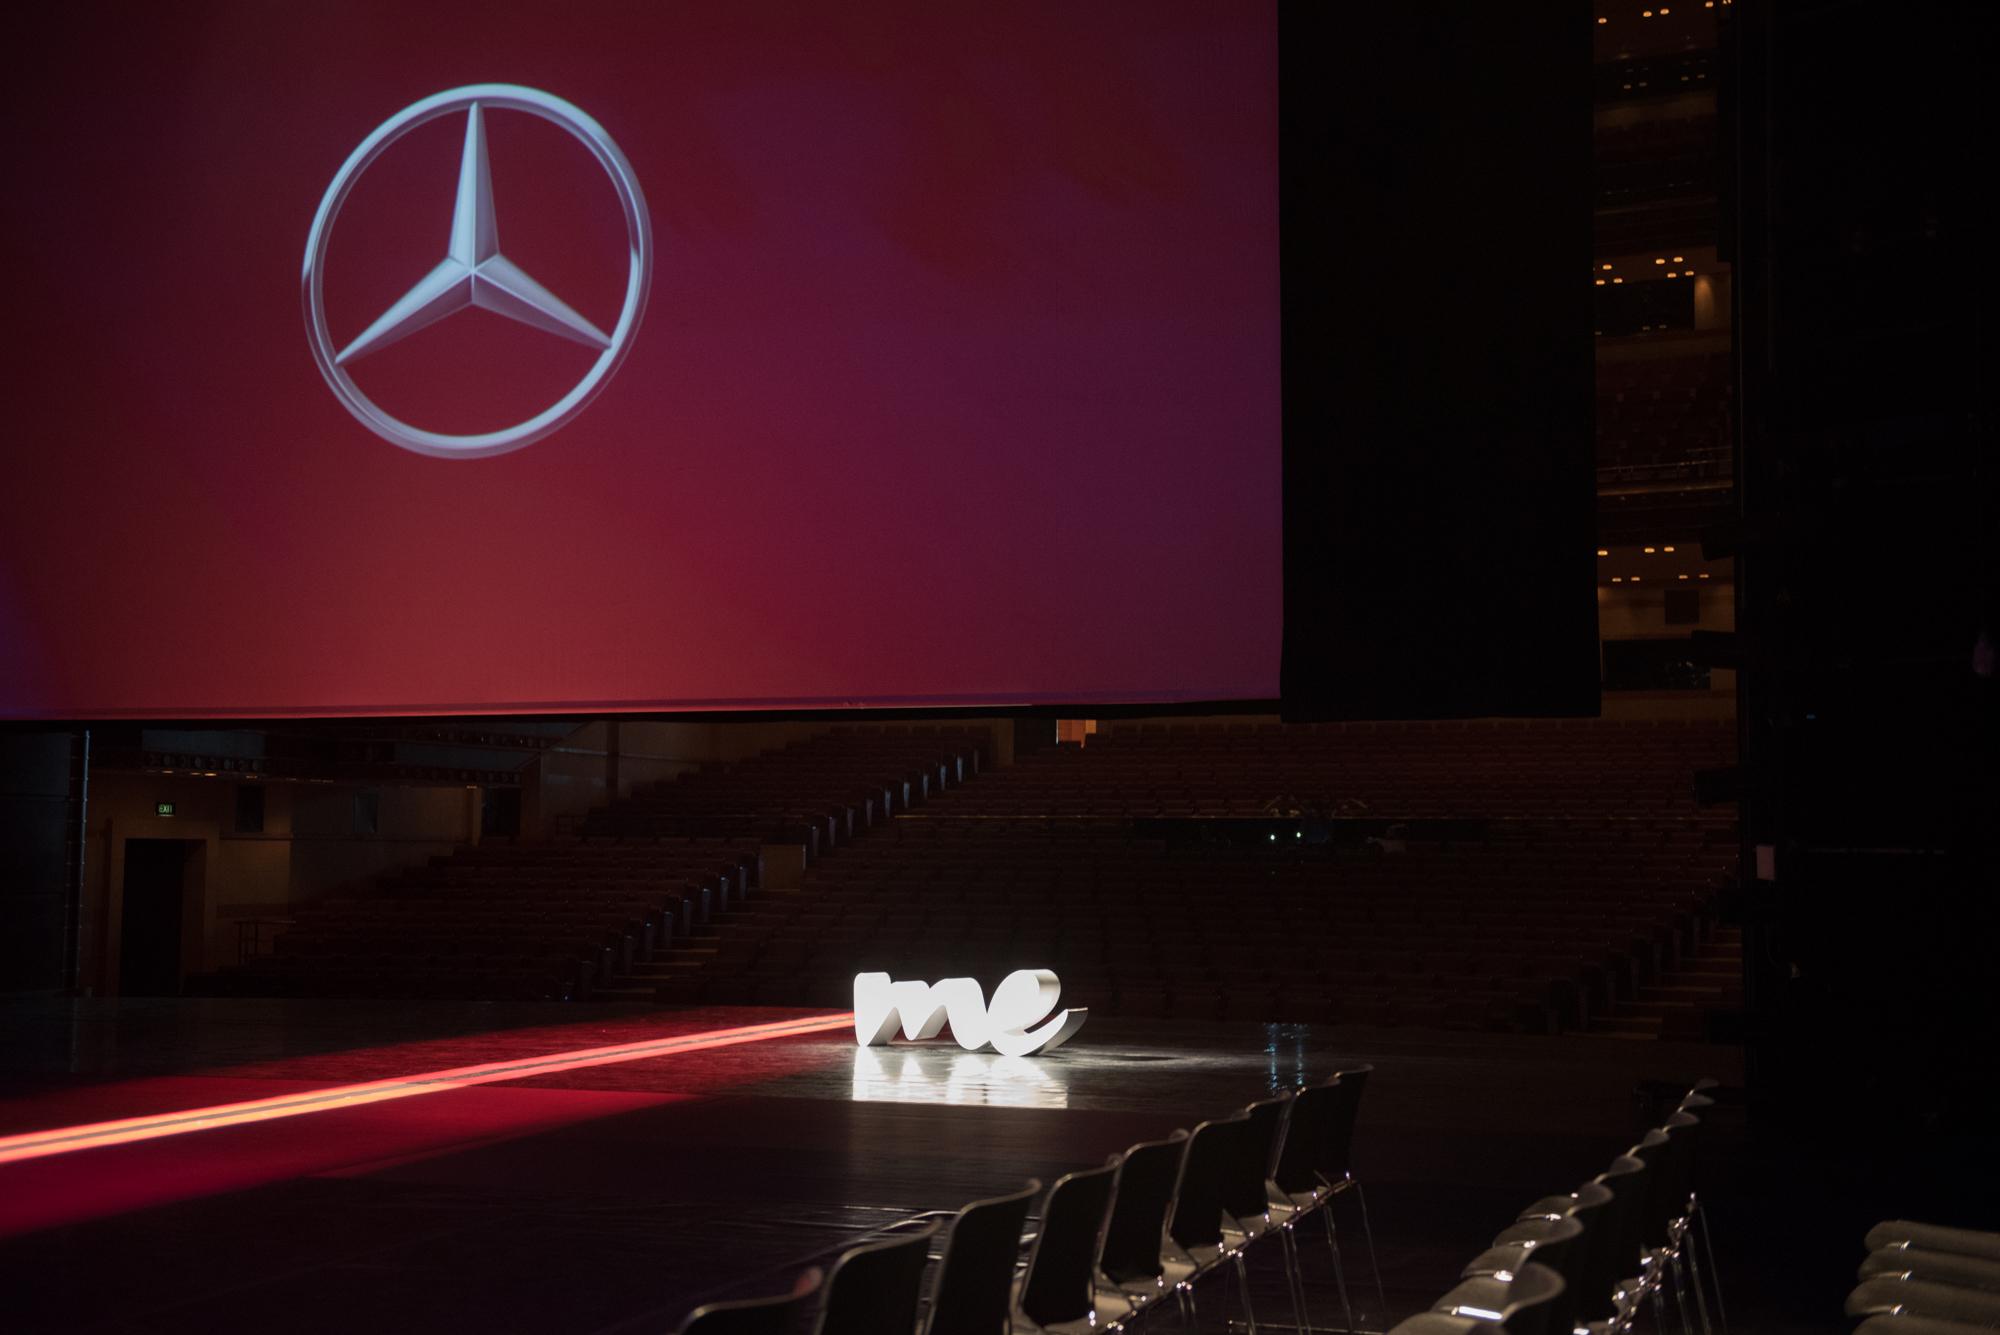 Mercedes me: Η σχέση οδηγού και αυτοκινήτου γίνεται πιο δημιουργική